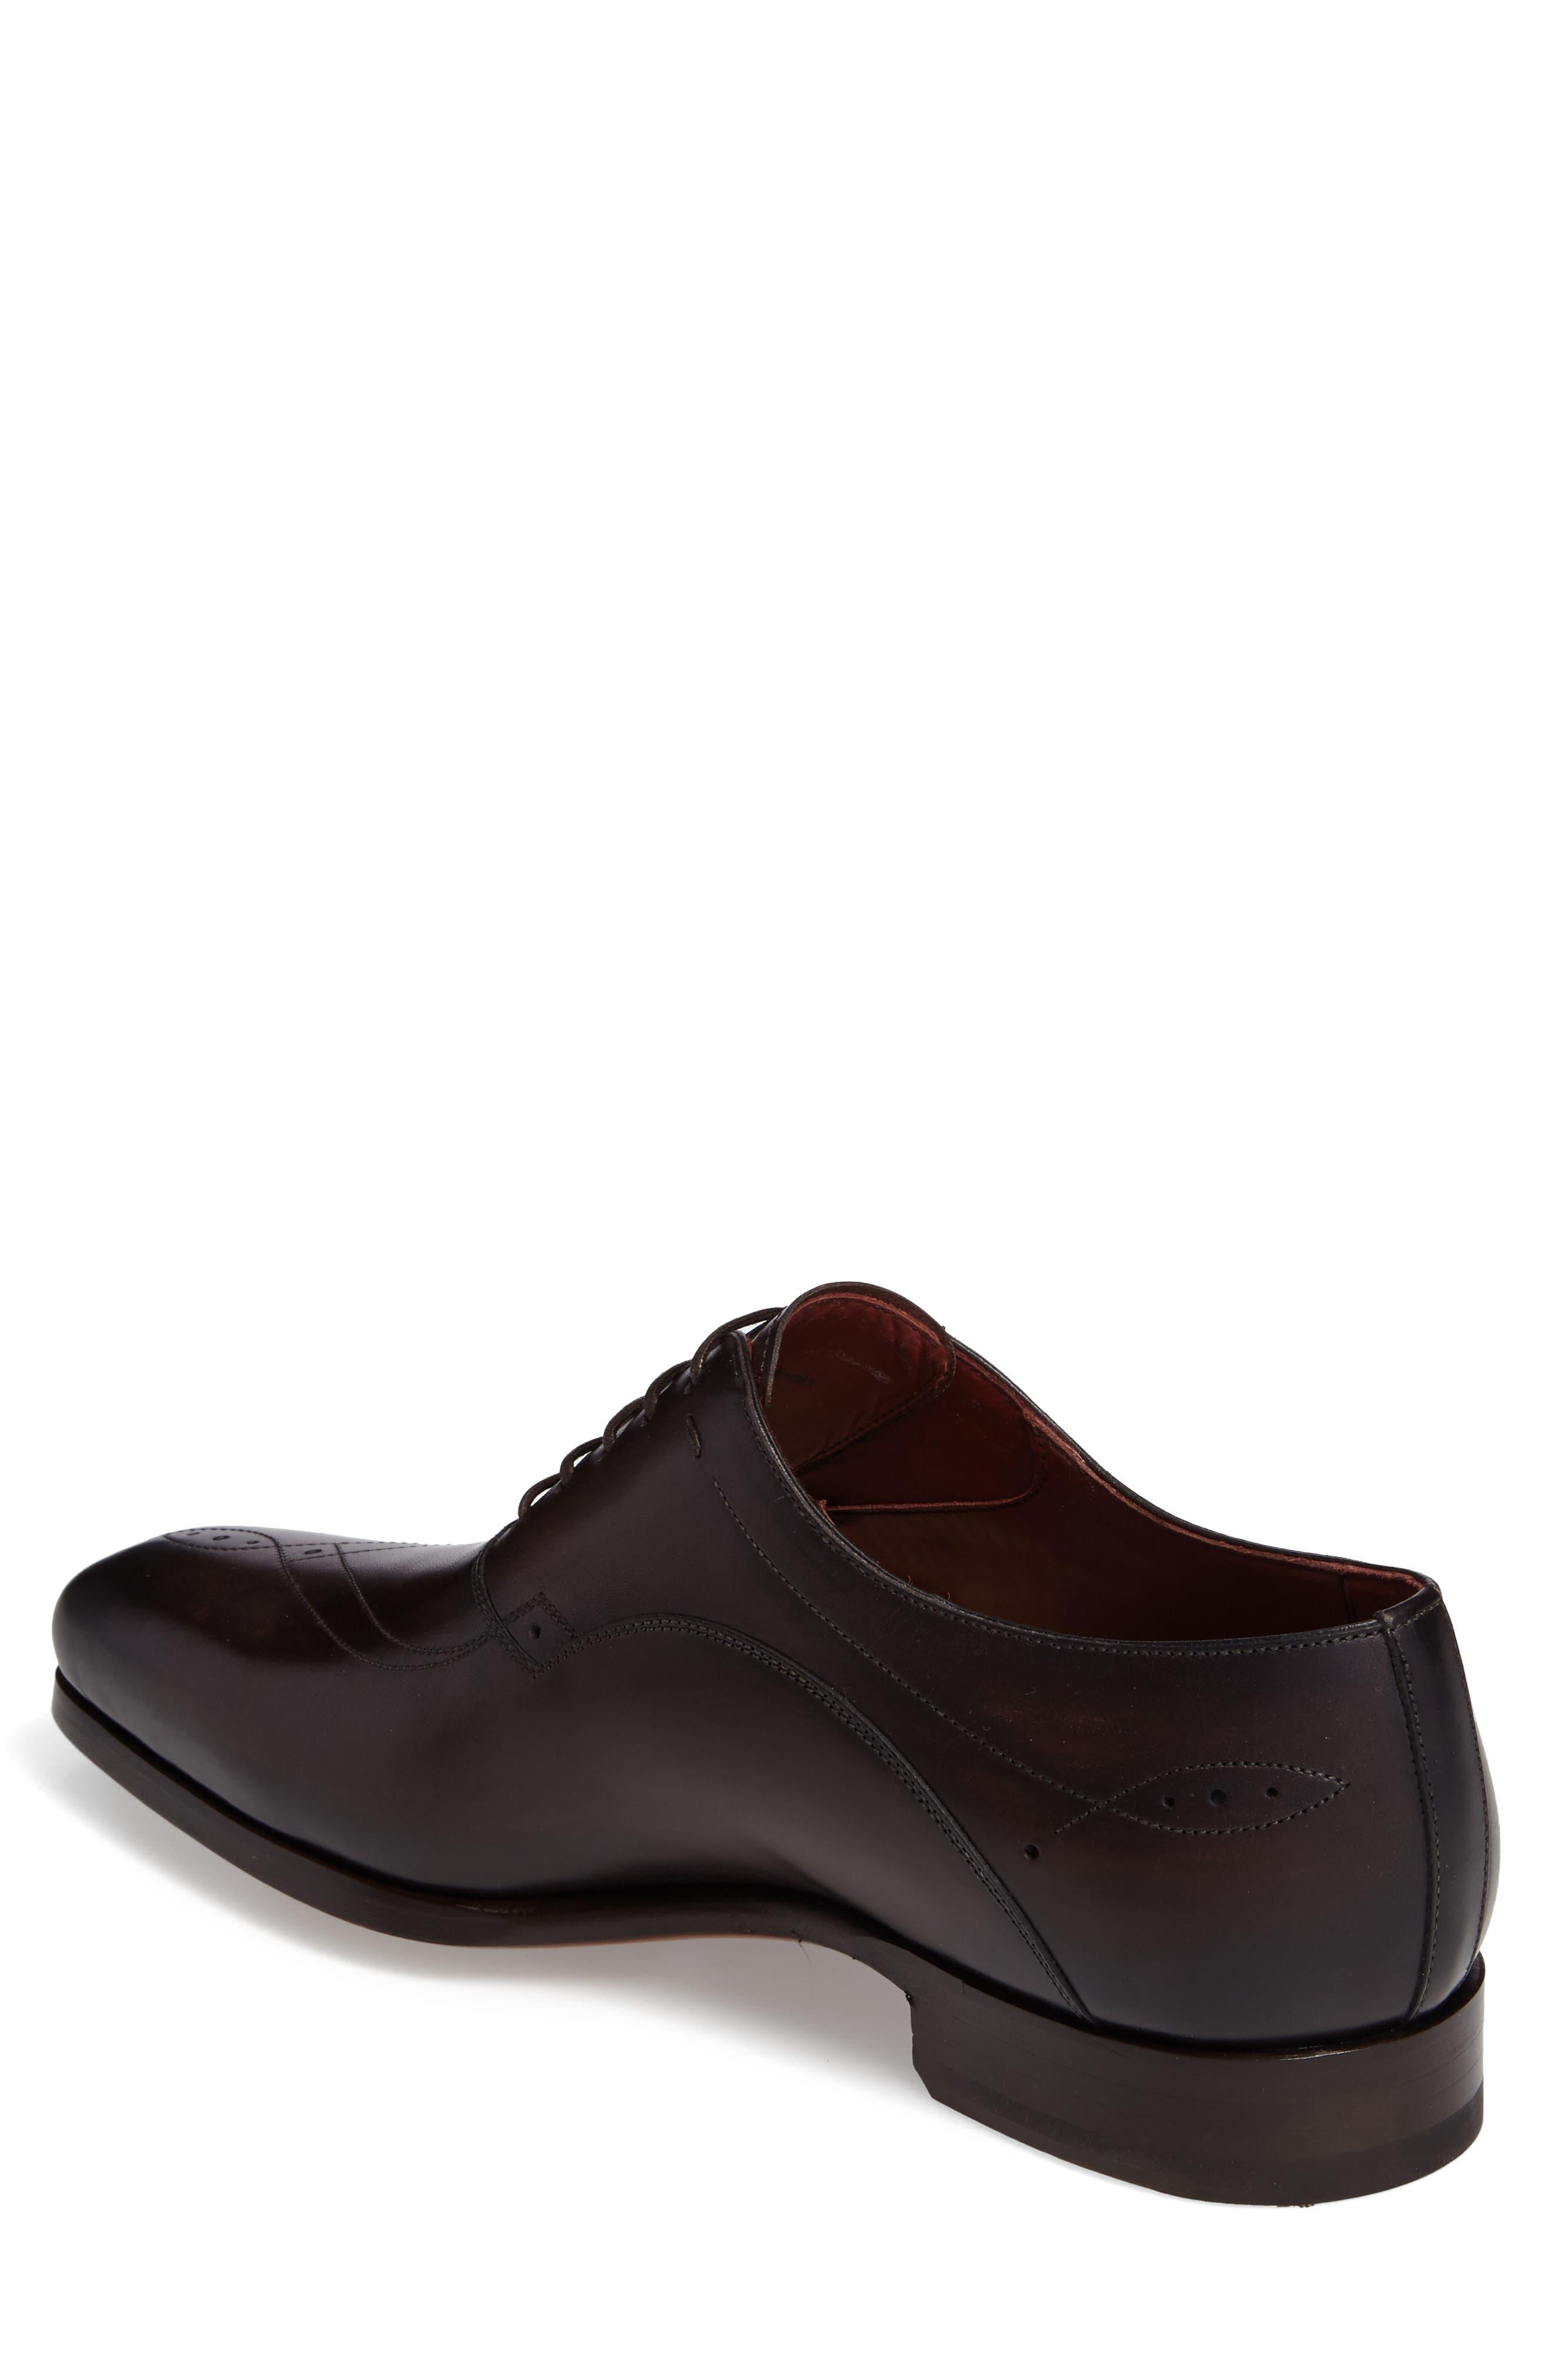 Alternate Image 2  - Magnanni Francisco Plain Toe Oxford (Men)